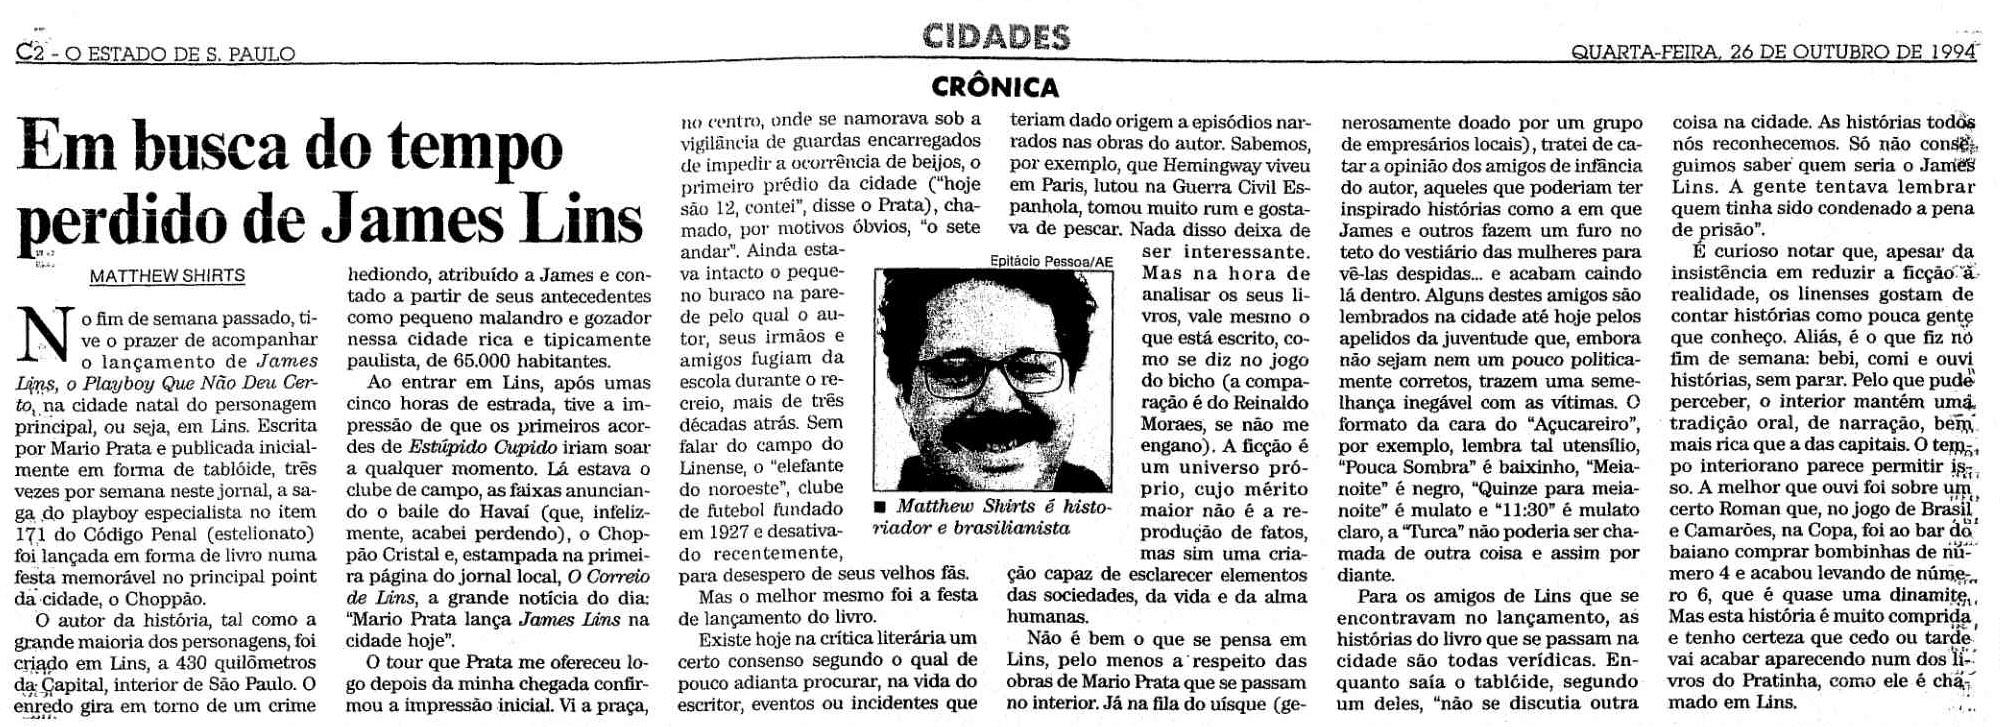 critica_matthews_estadao